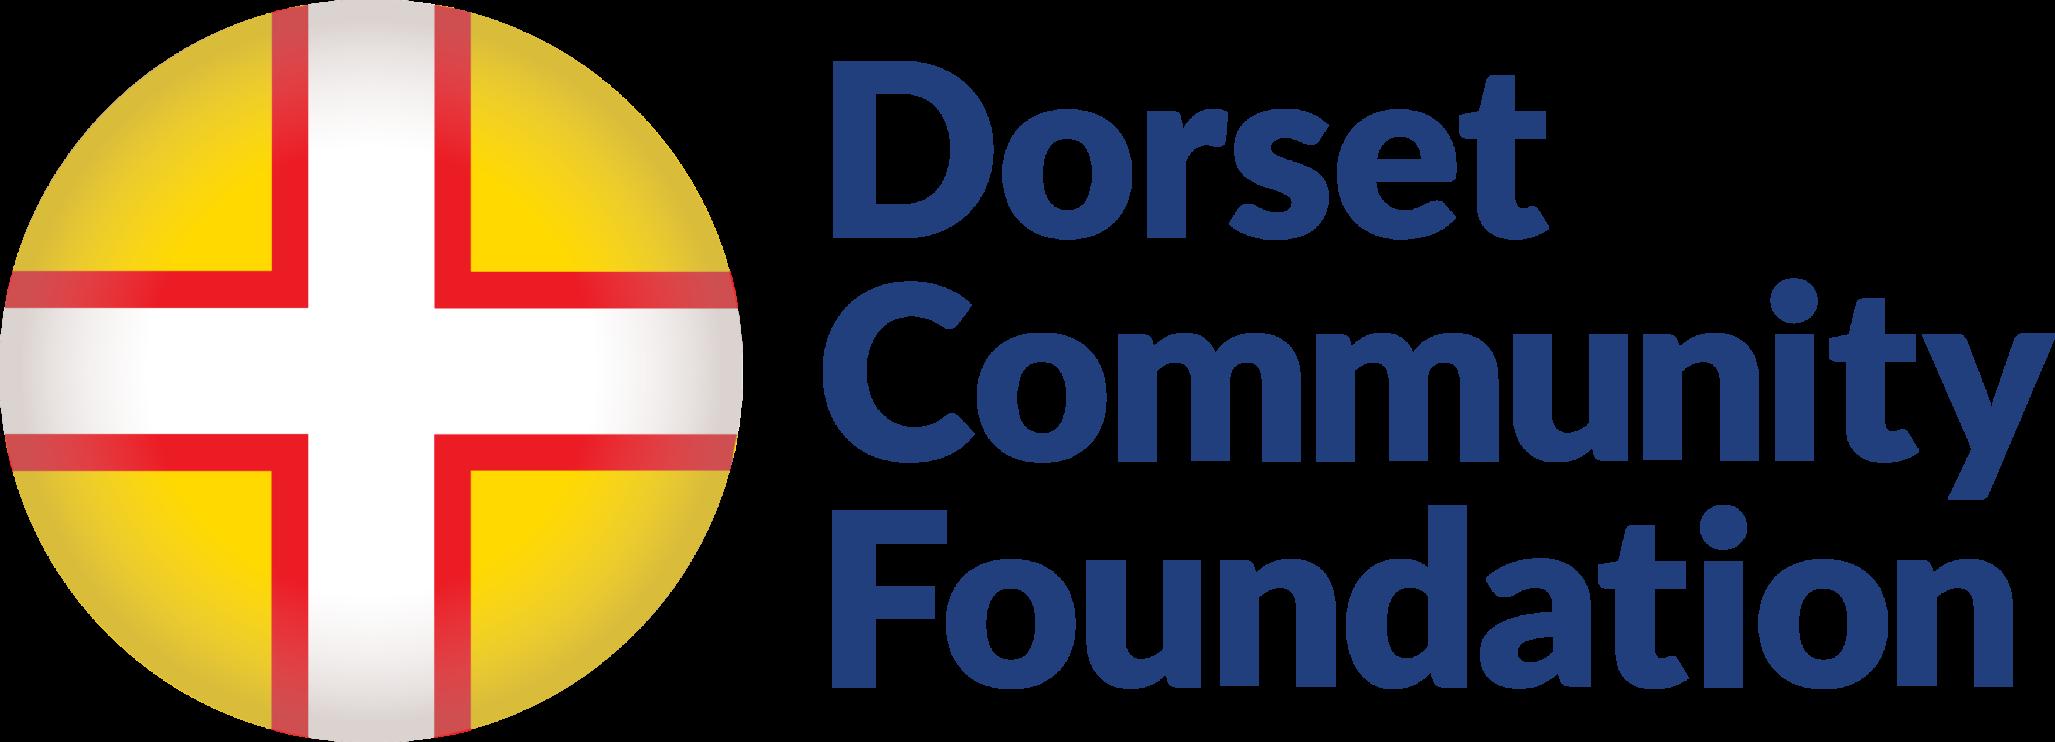 Dorset Community Foundation